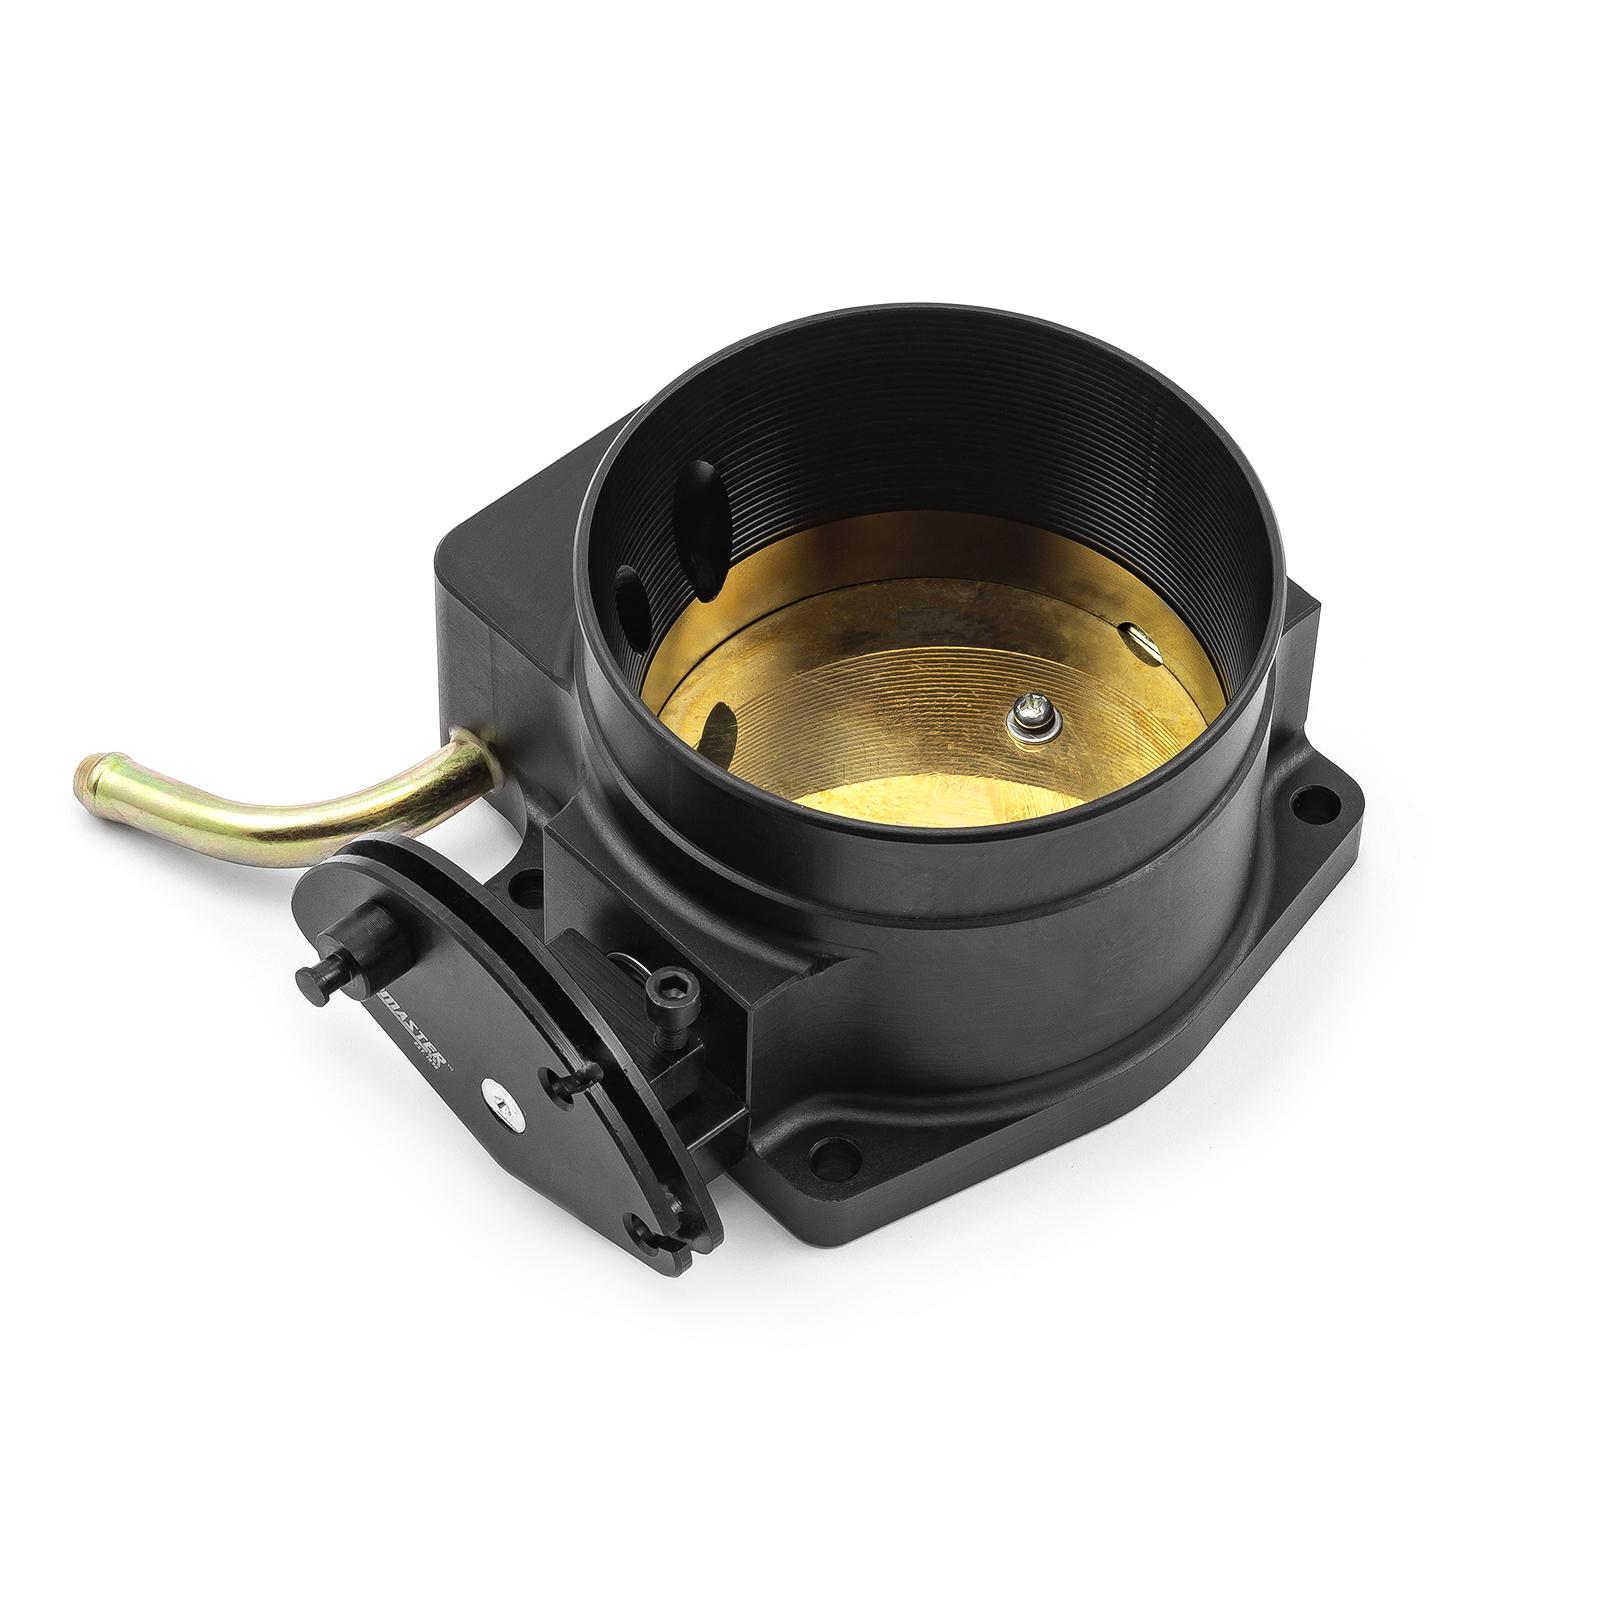 92 mm LS2 4Bolt High Flow Throttle Body Black